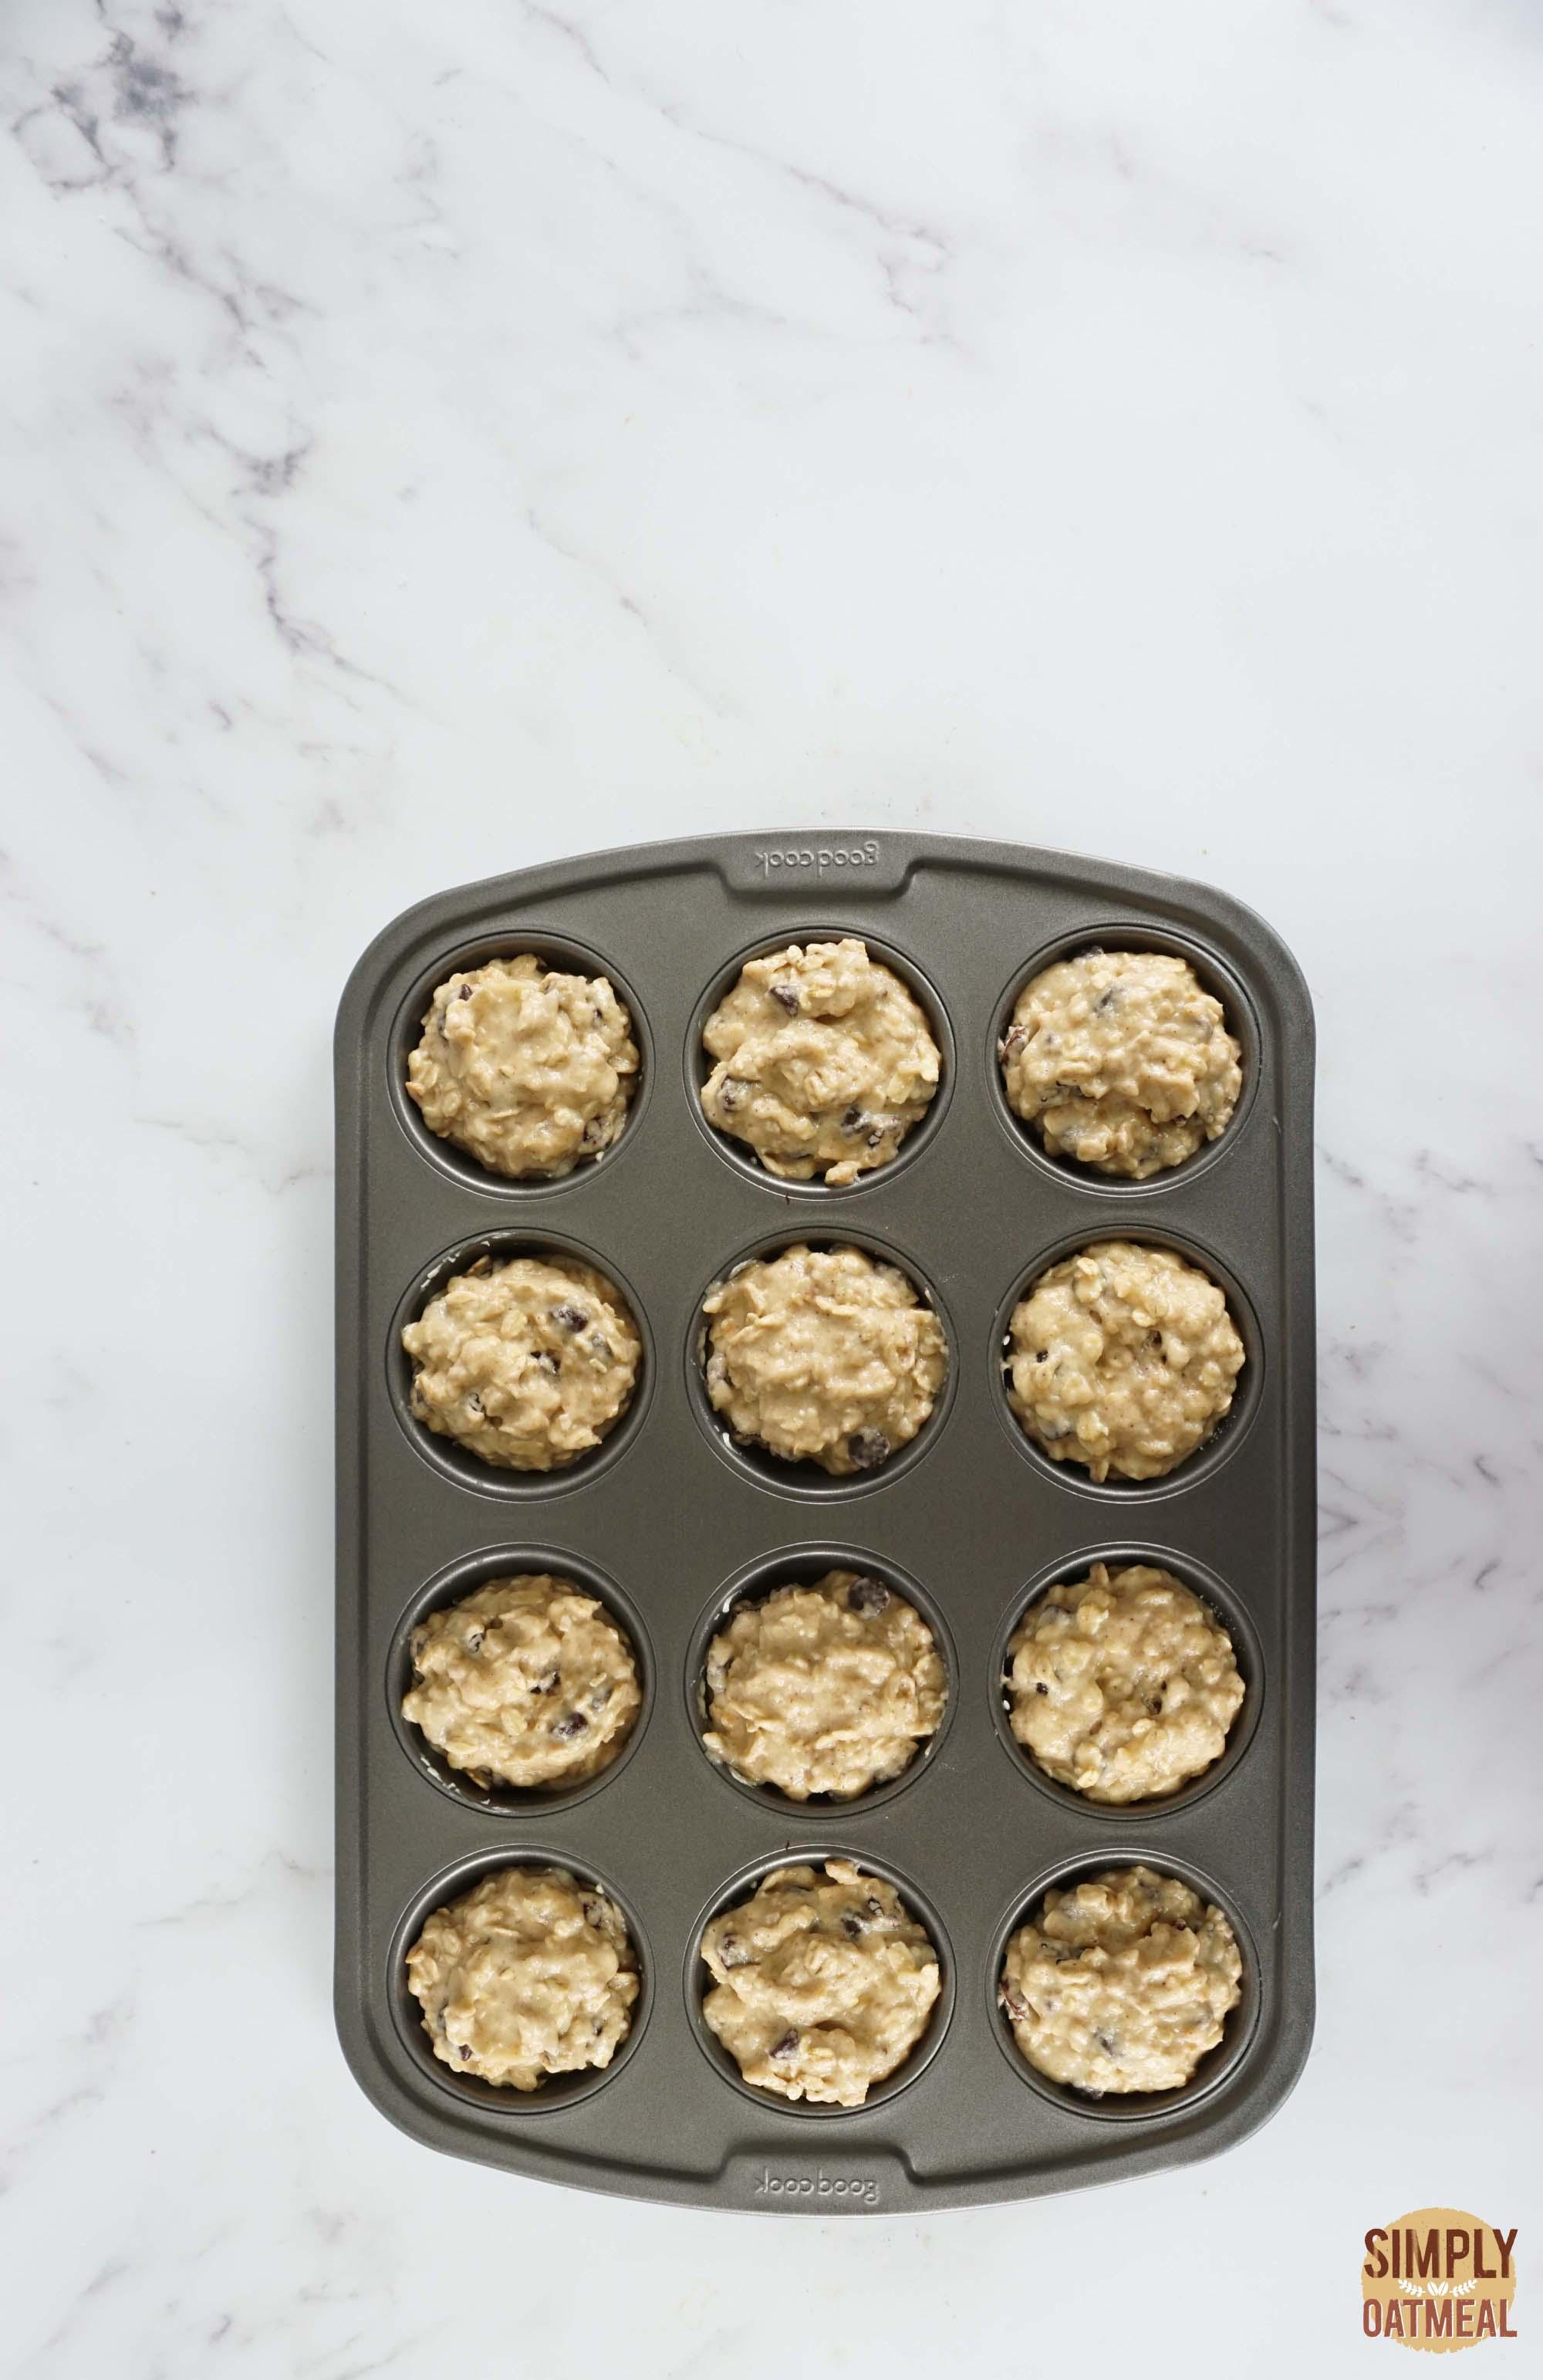 Applesauce oatmeal muffins batter in a prepared muffin pan